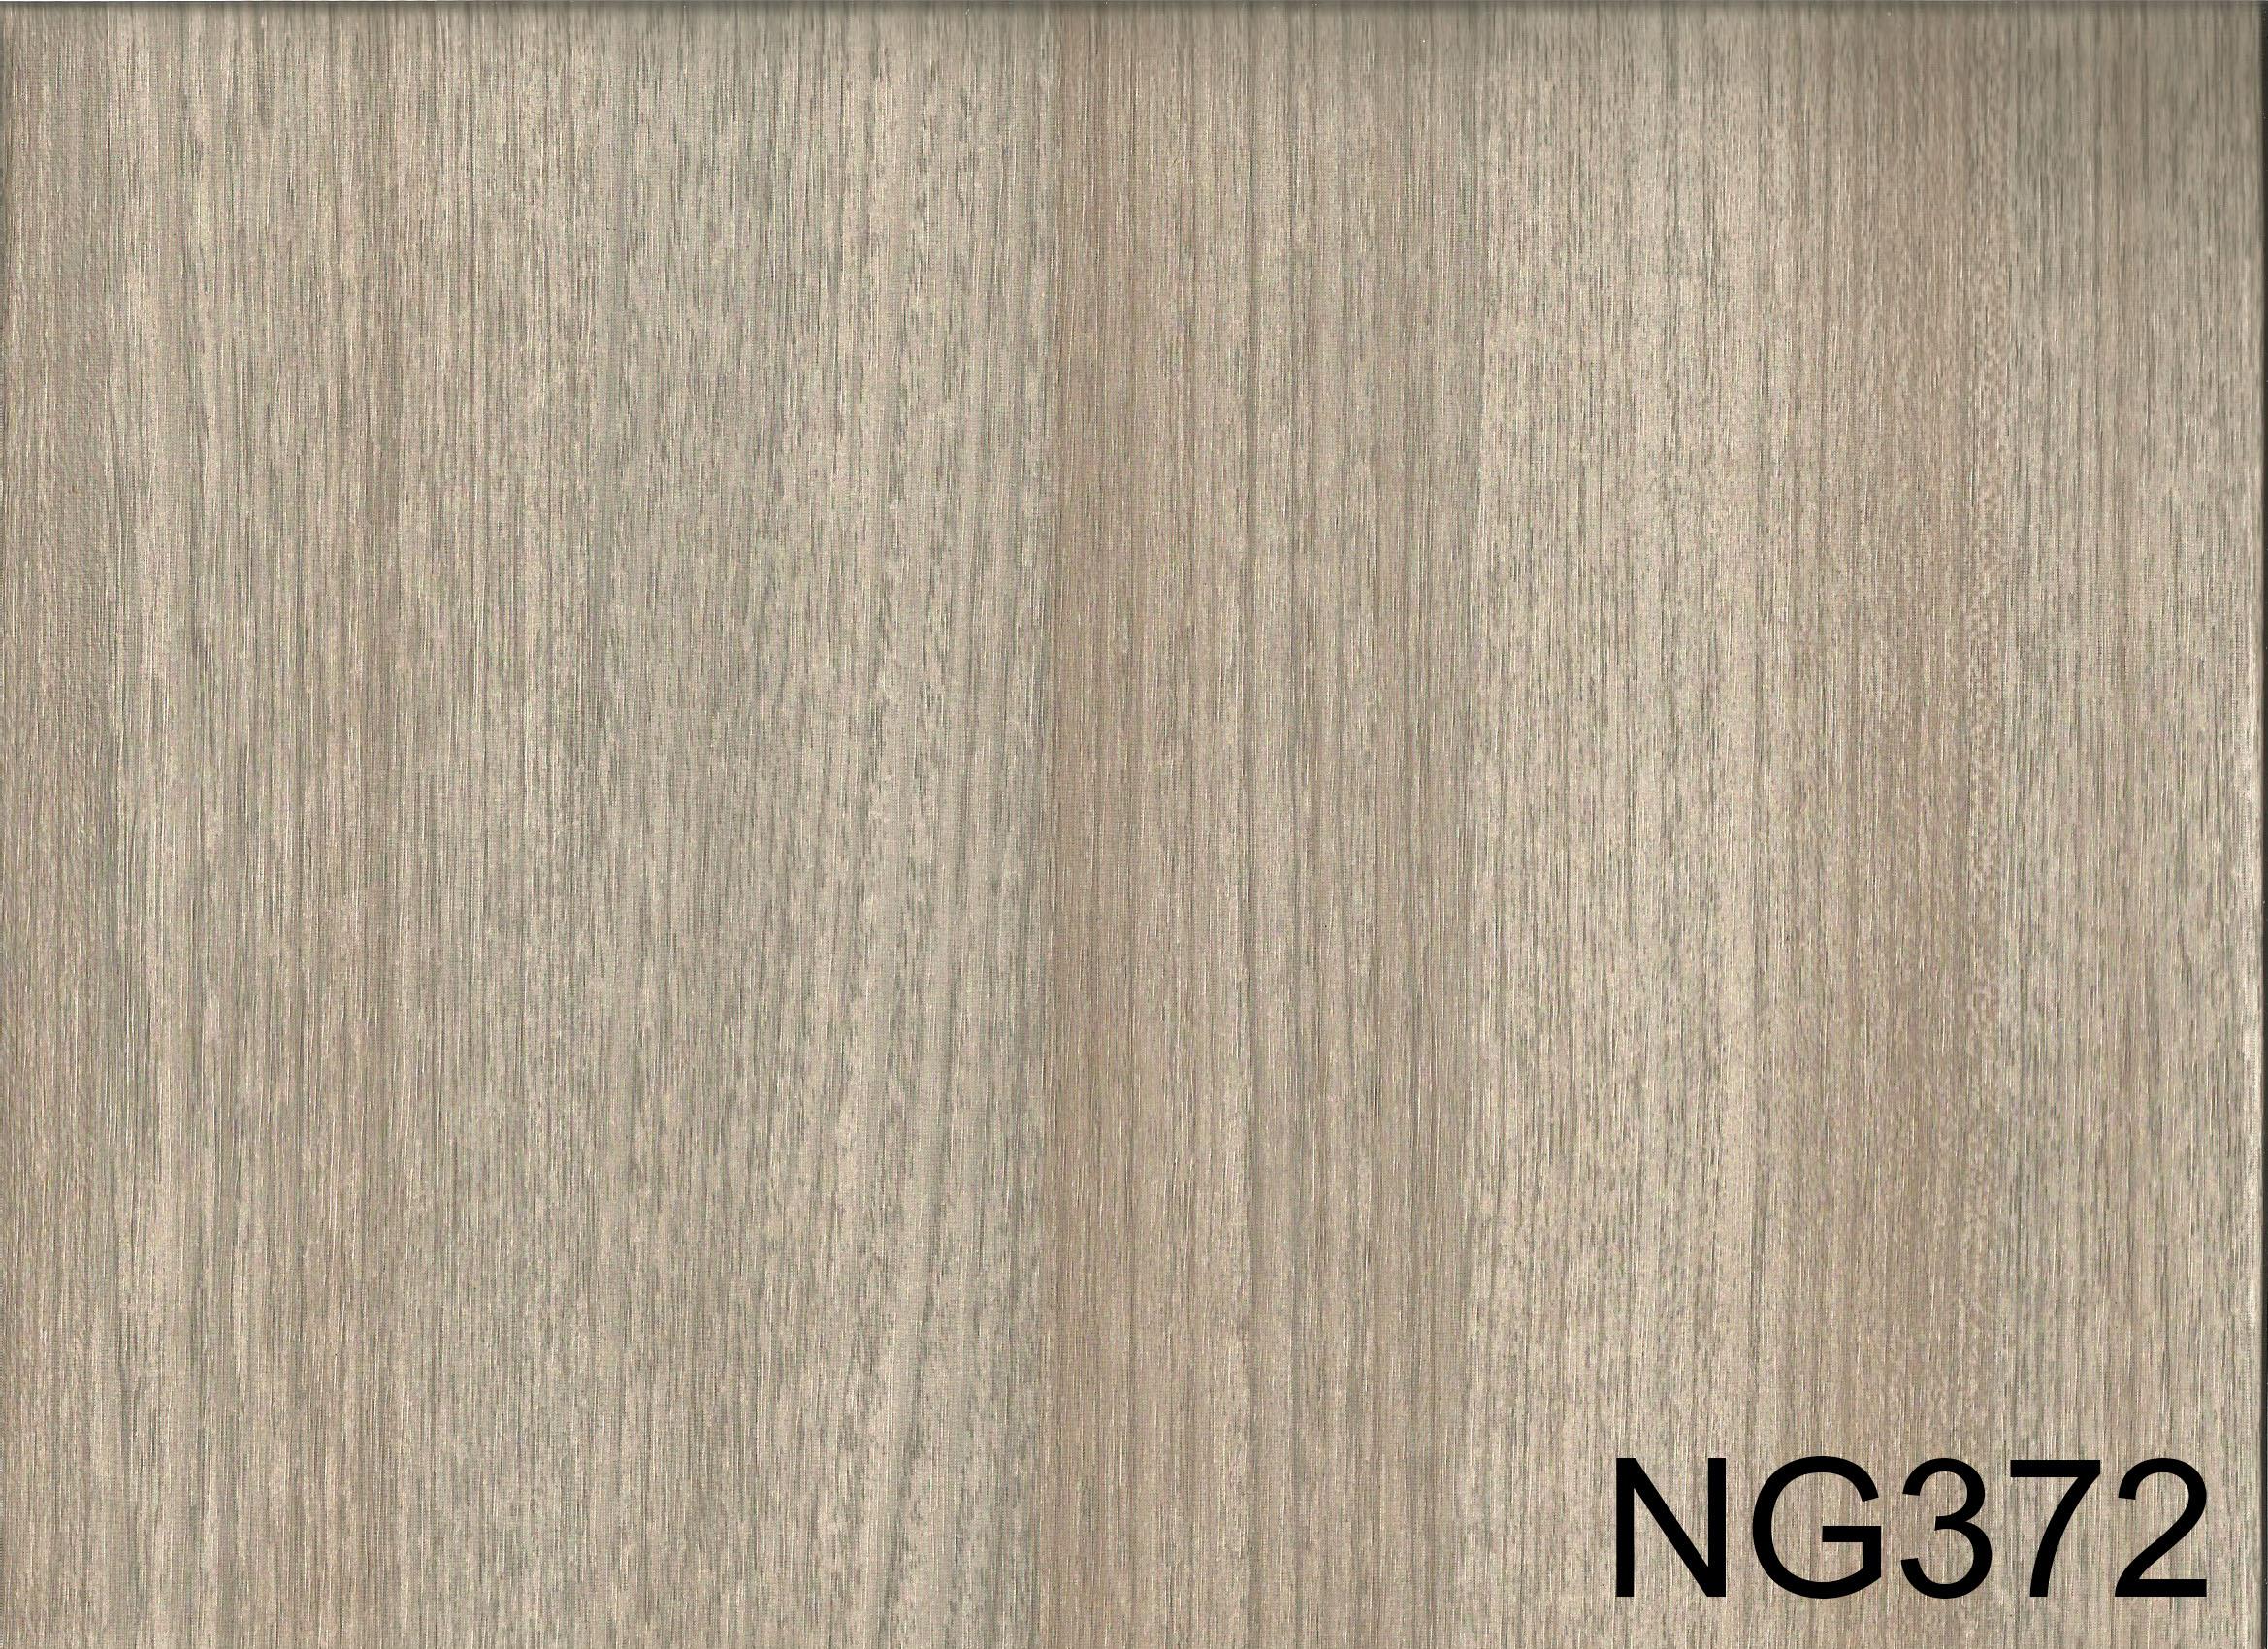 NG372